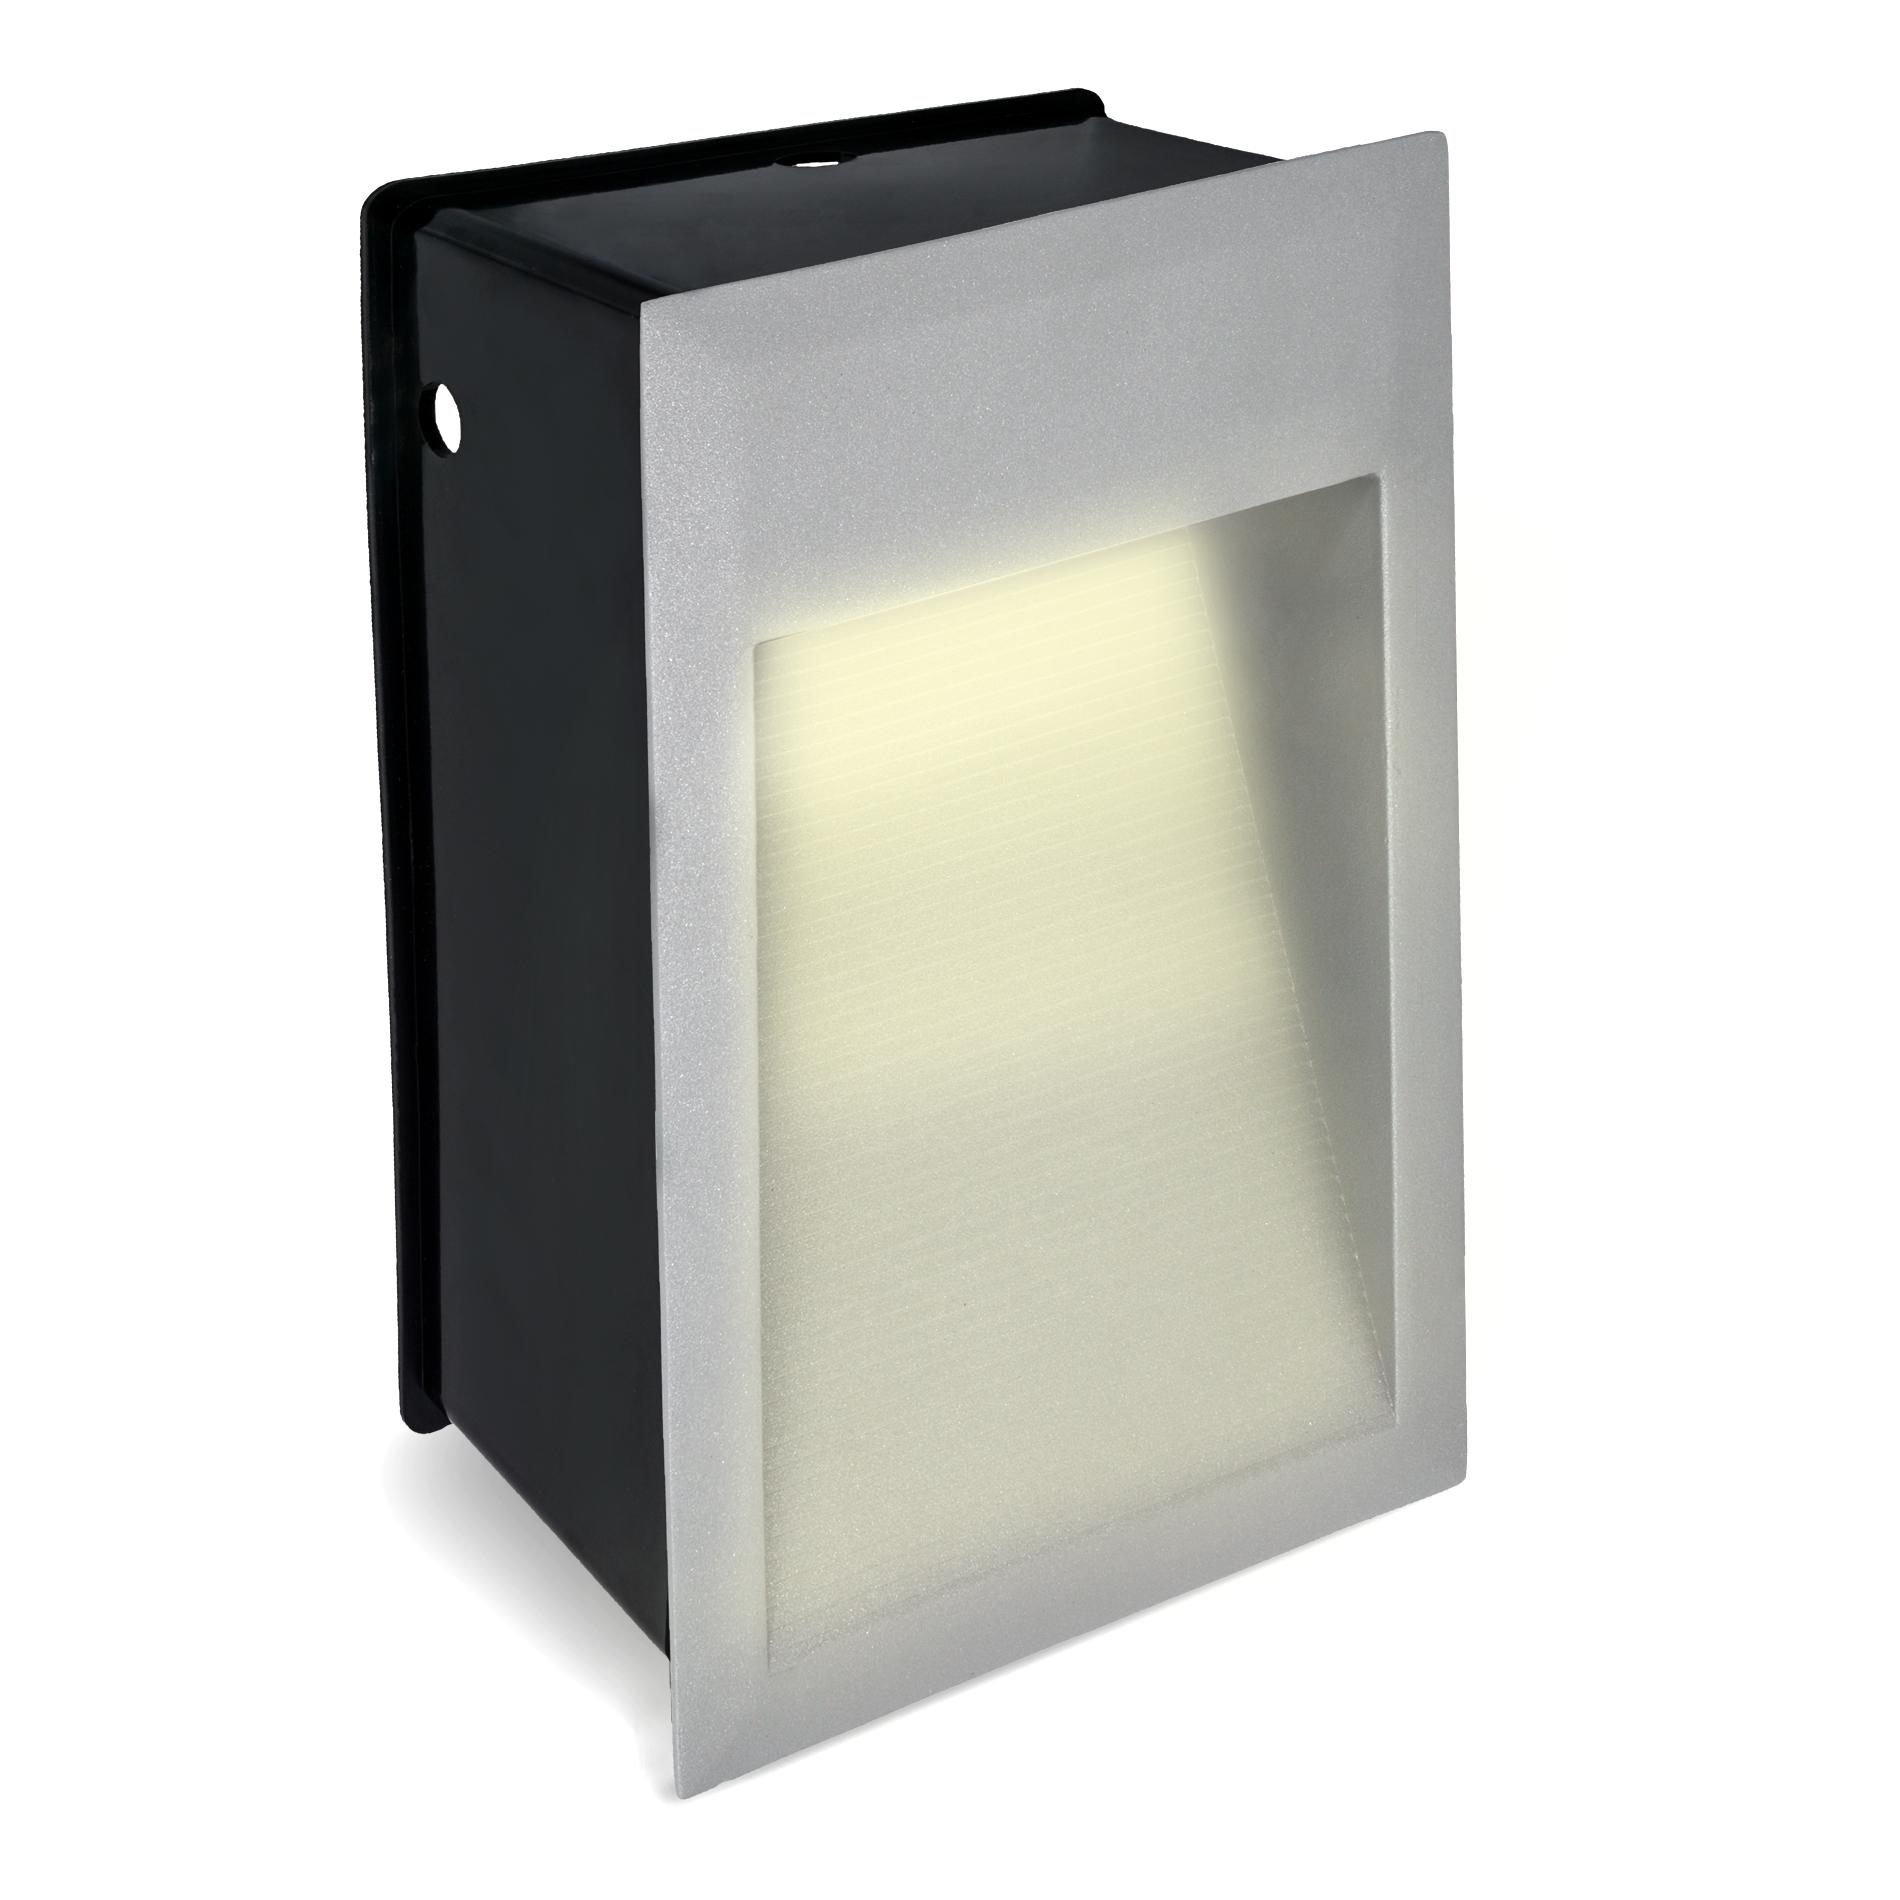 led wandeinbauleuchte treppenleuchte max j04 230v ip65 warmwei au en innen ebay. Black Bedroom Furniture Sets. Home Design Ideas